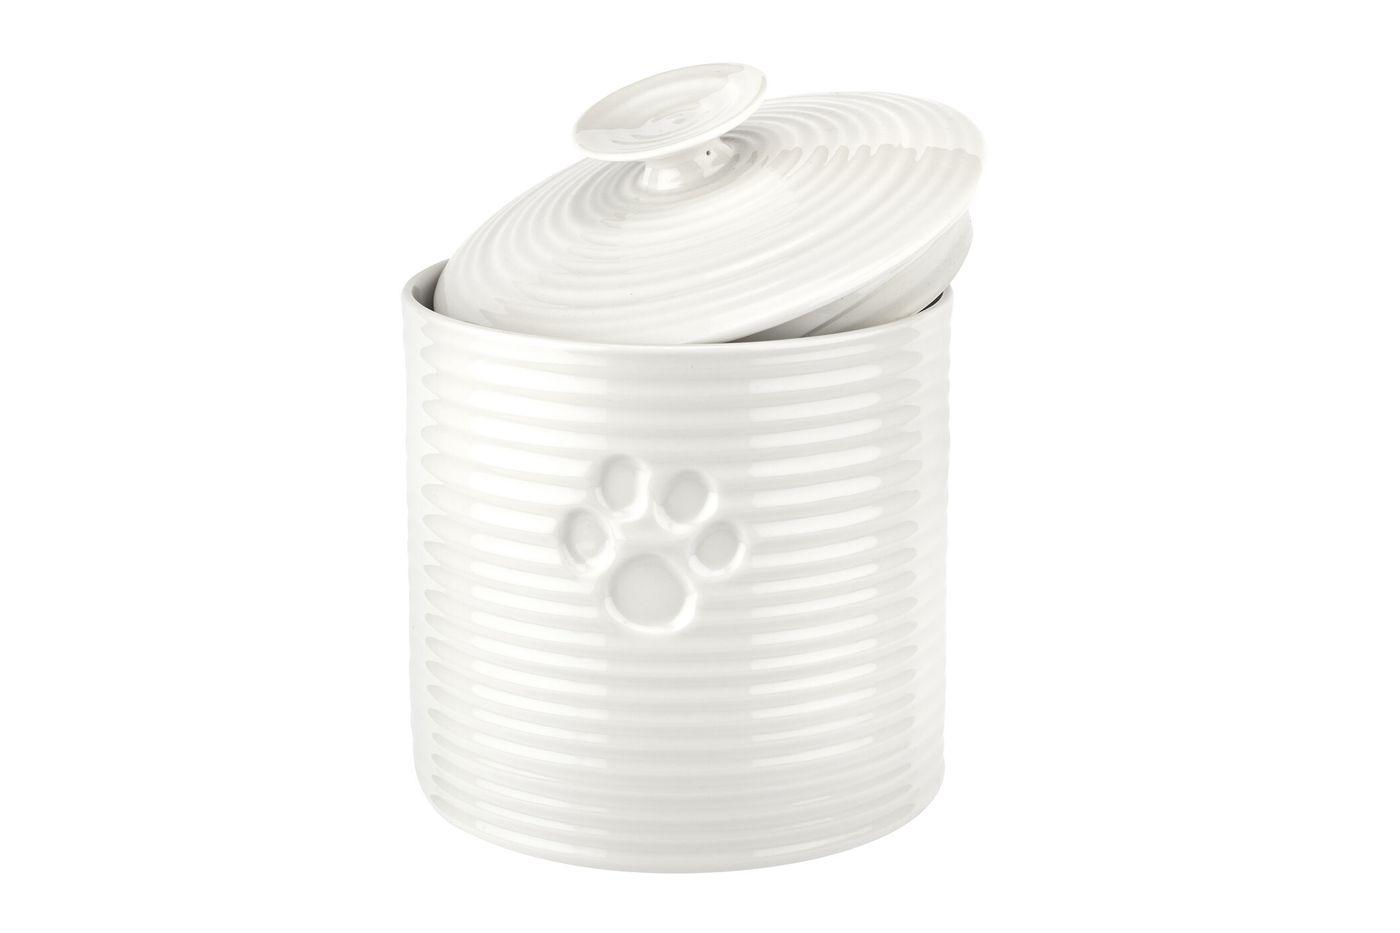 Sophie Conran for Portmeirion White Pet Treat Jar 16.5cm thumb 4